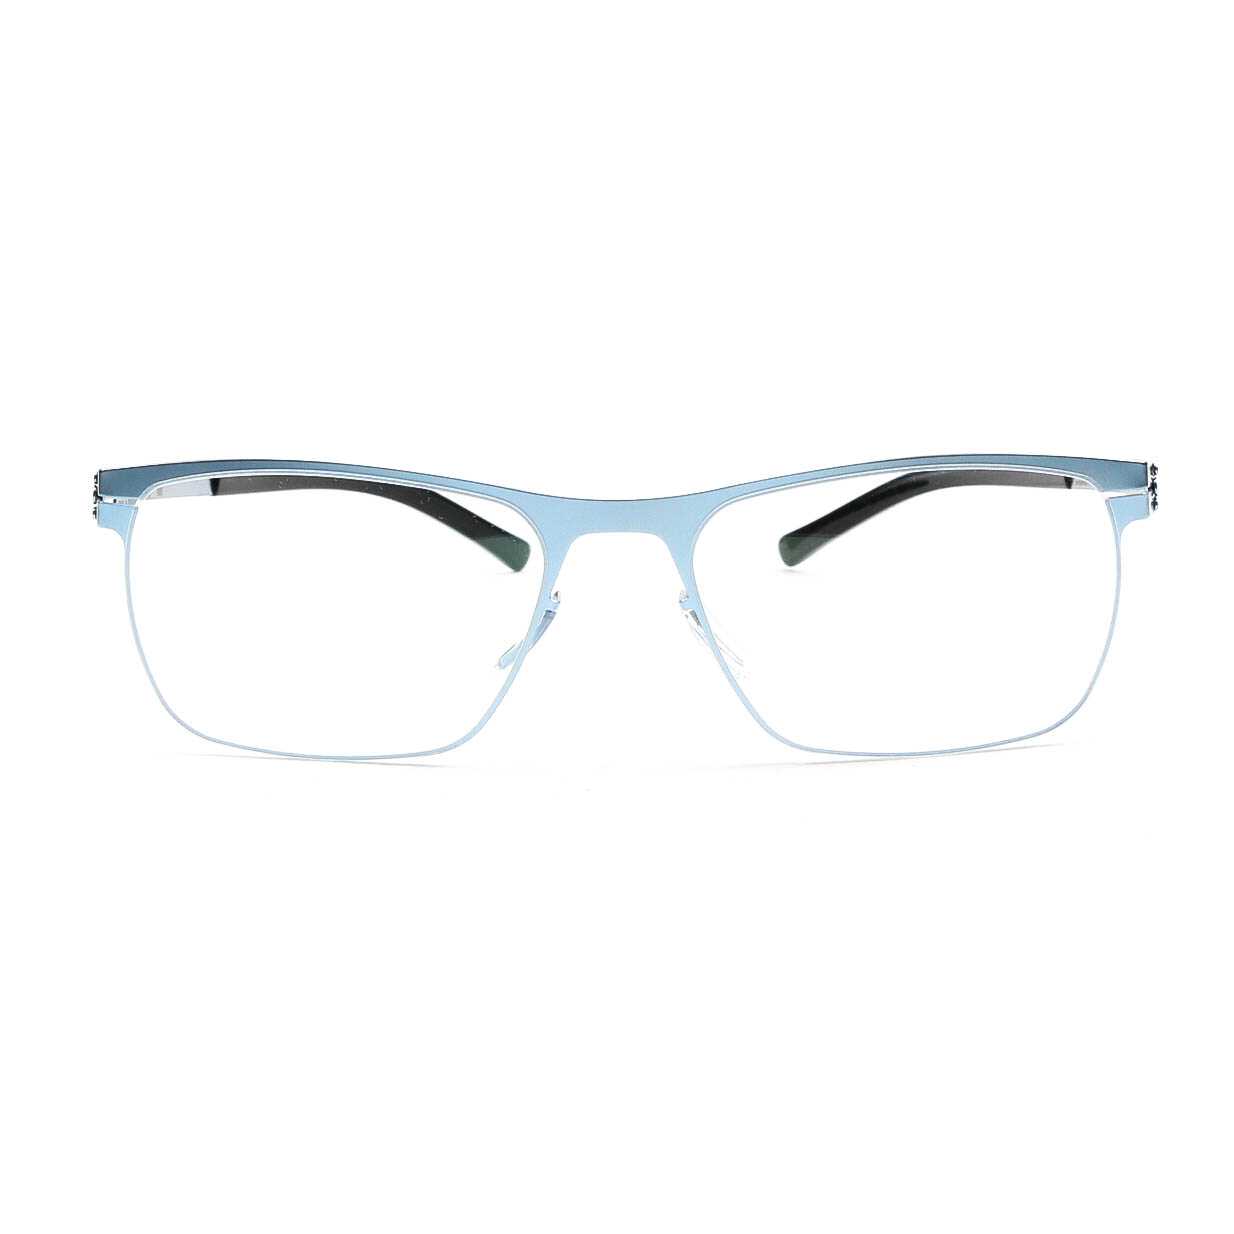 ic! berlin M1221 Julius Eyeglasses Electric Light Blue ...